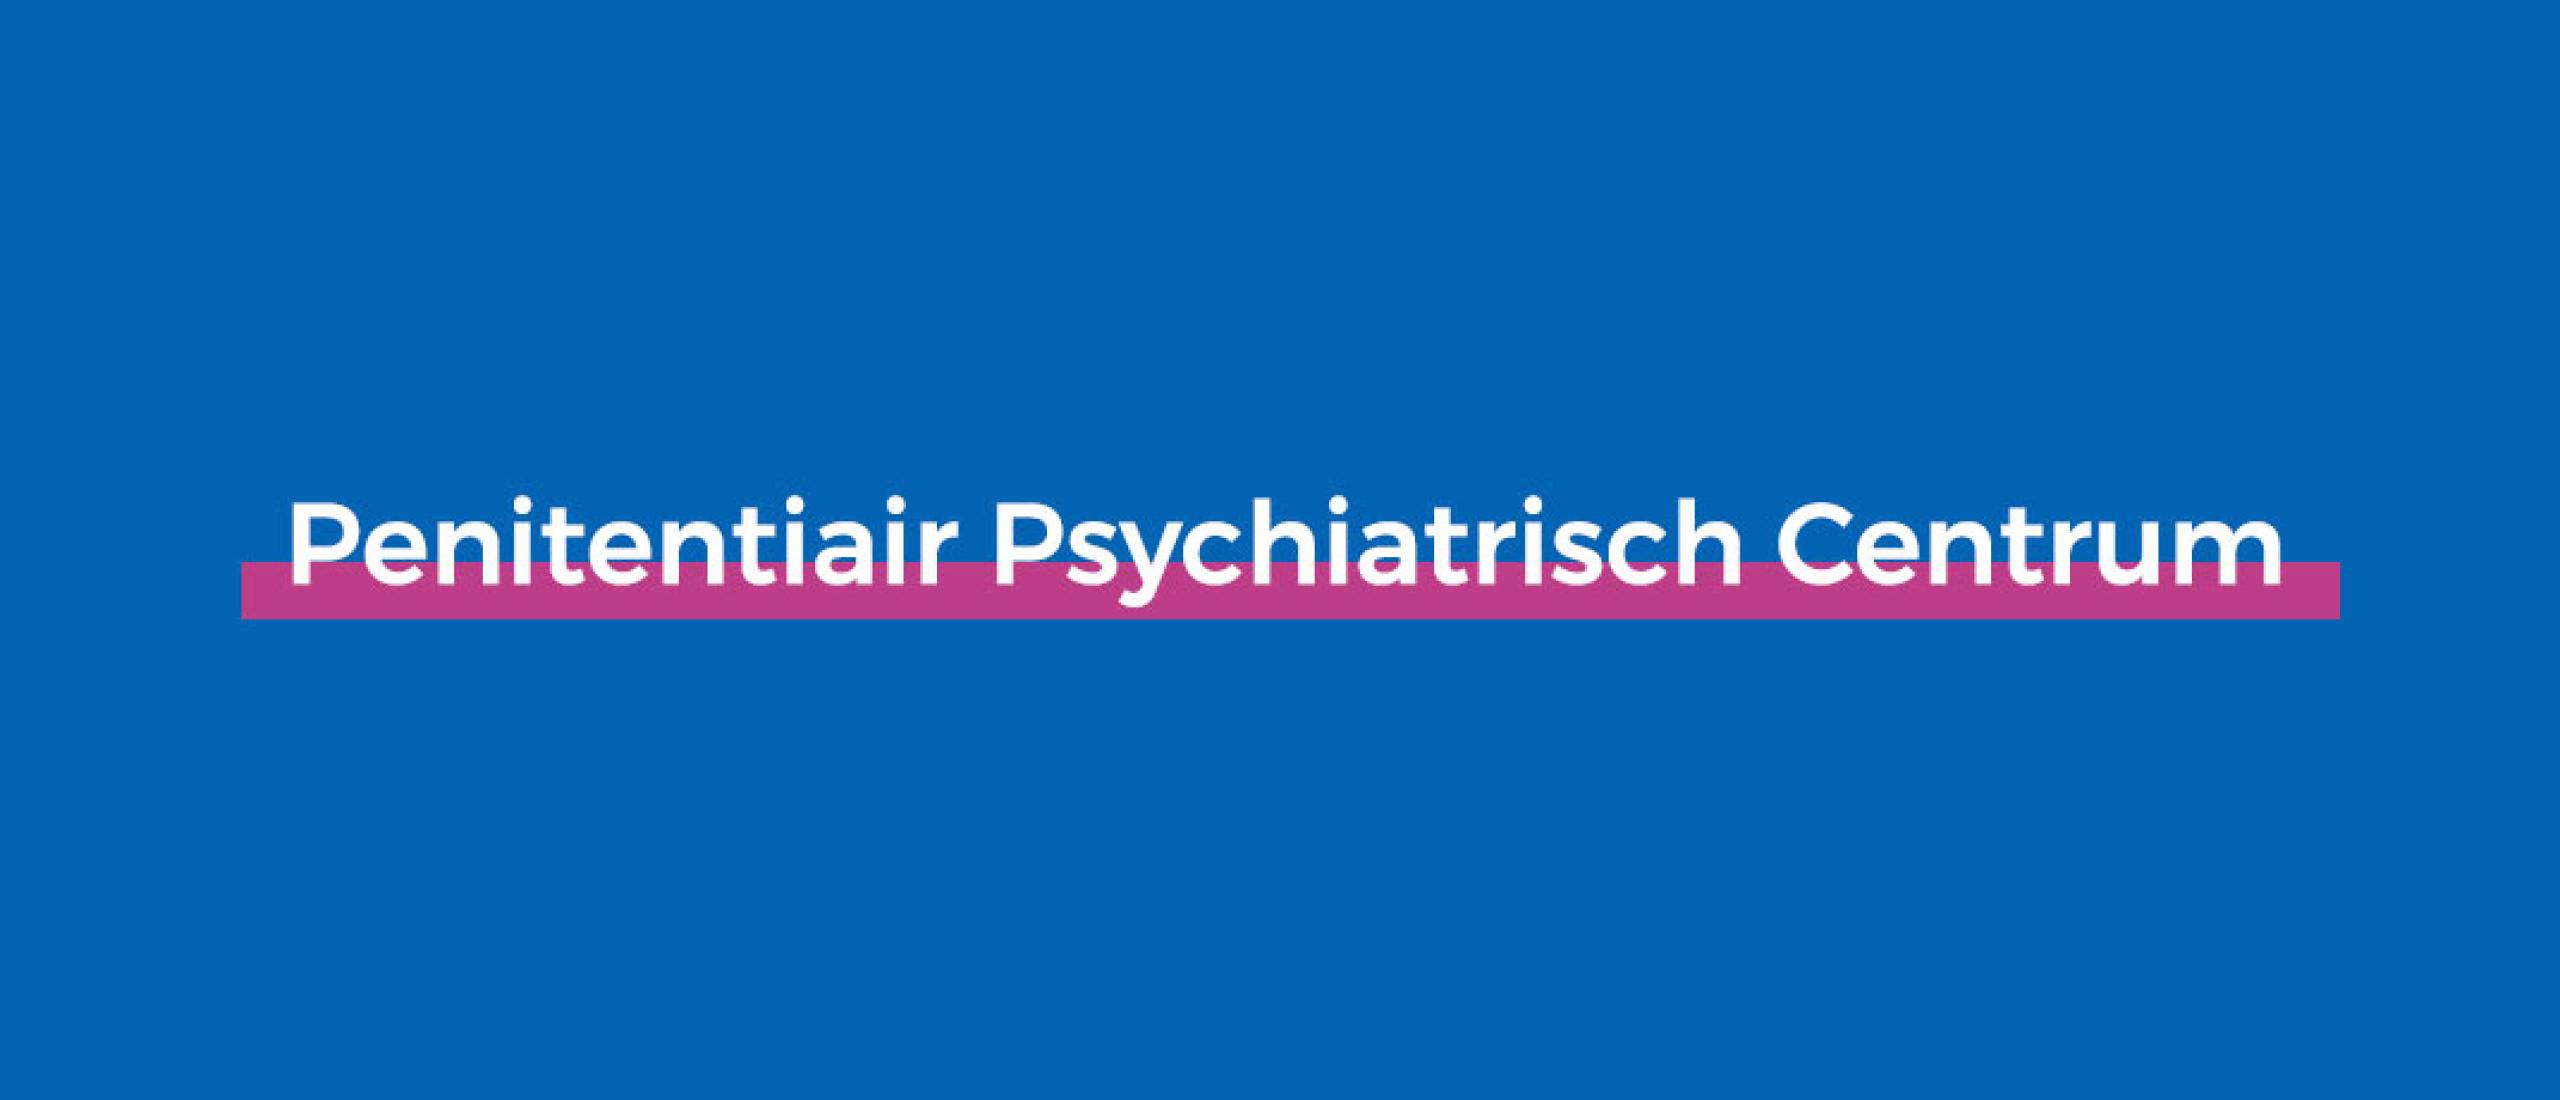 Wat is penitentiair Psychiatrisch Centrum